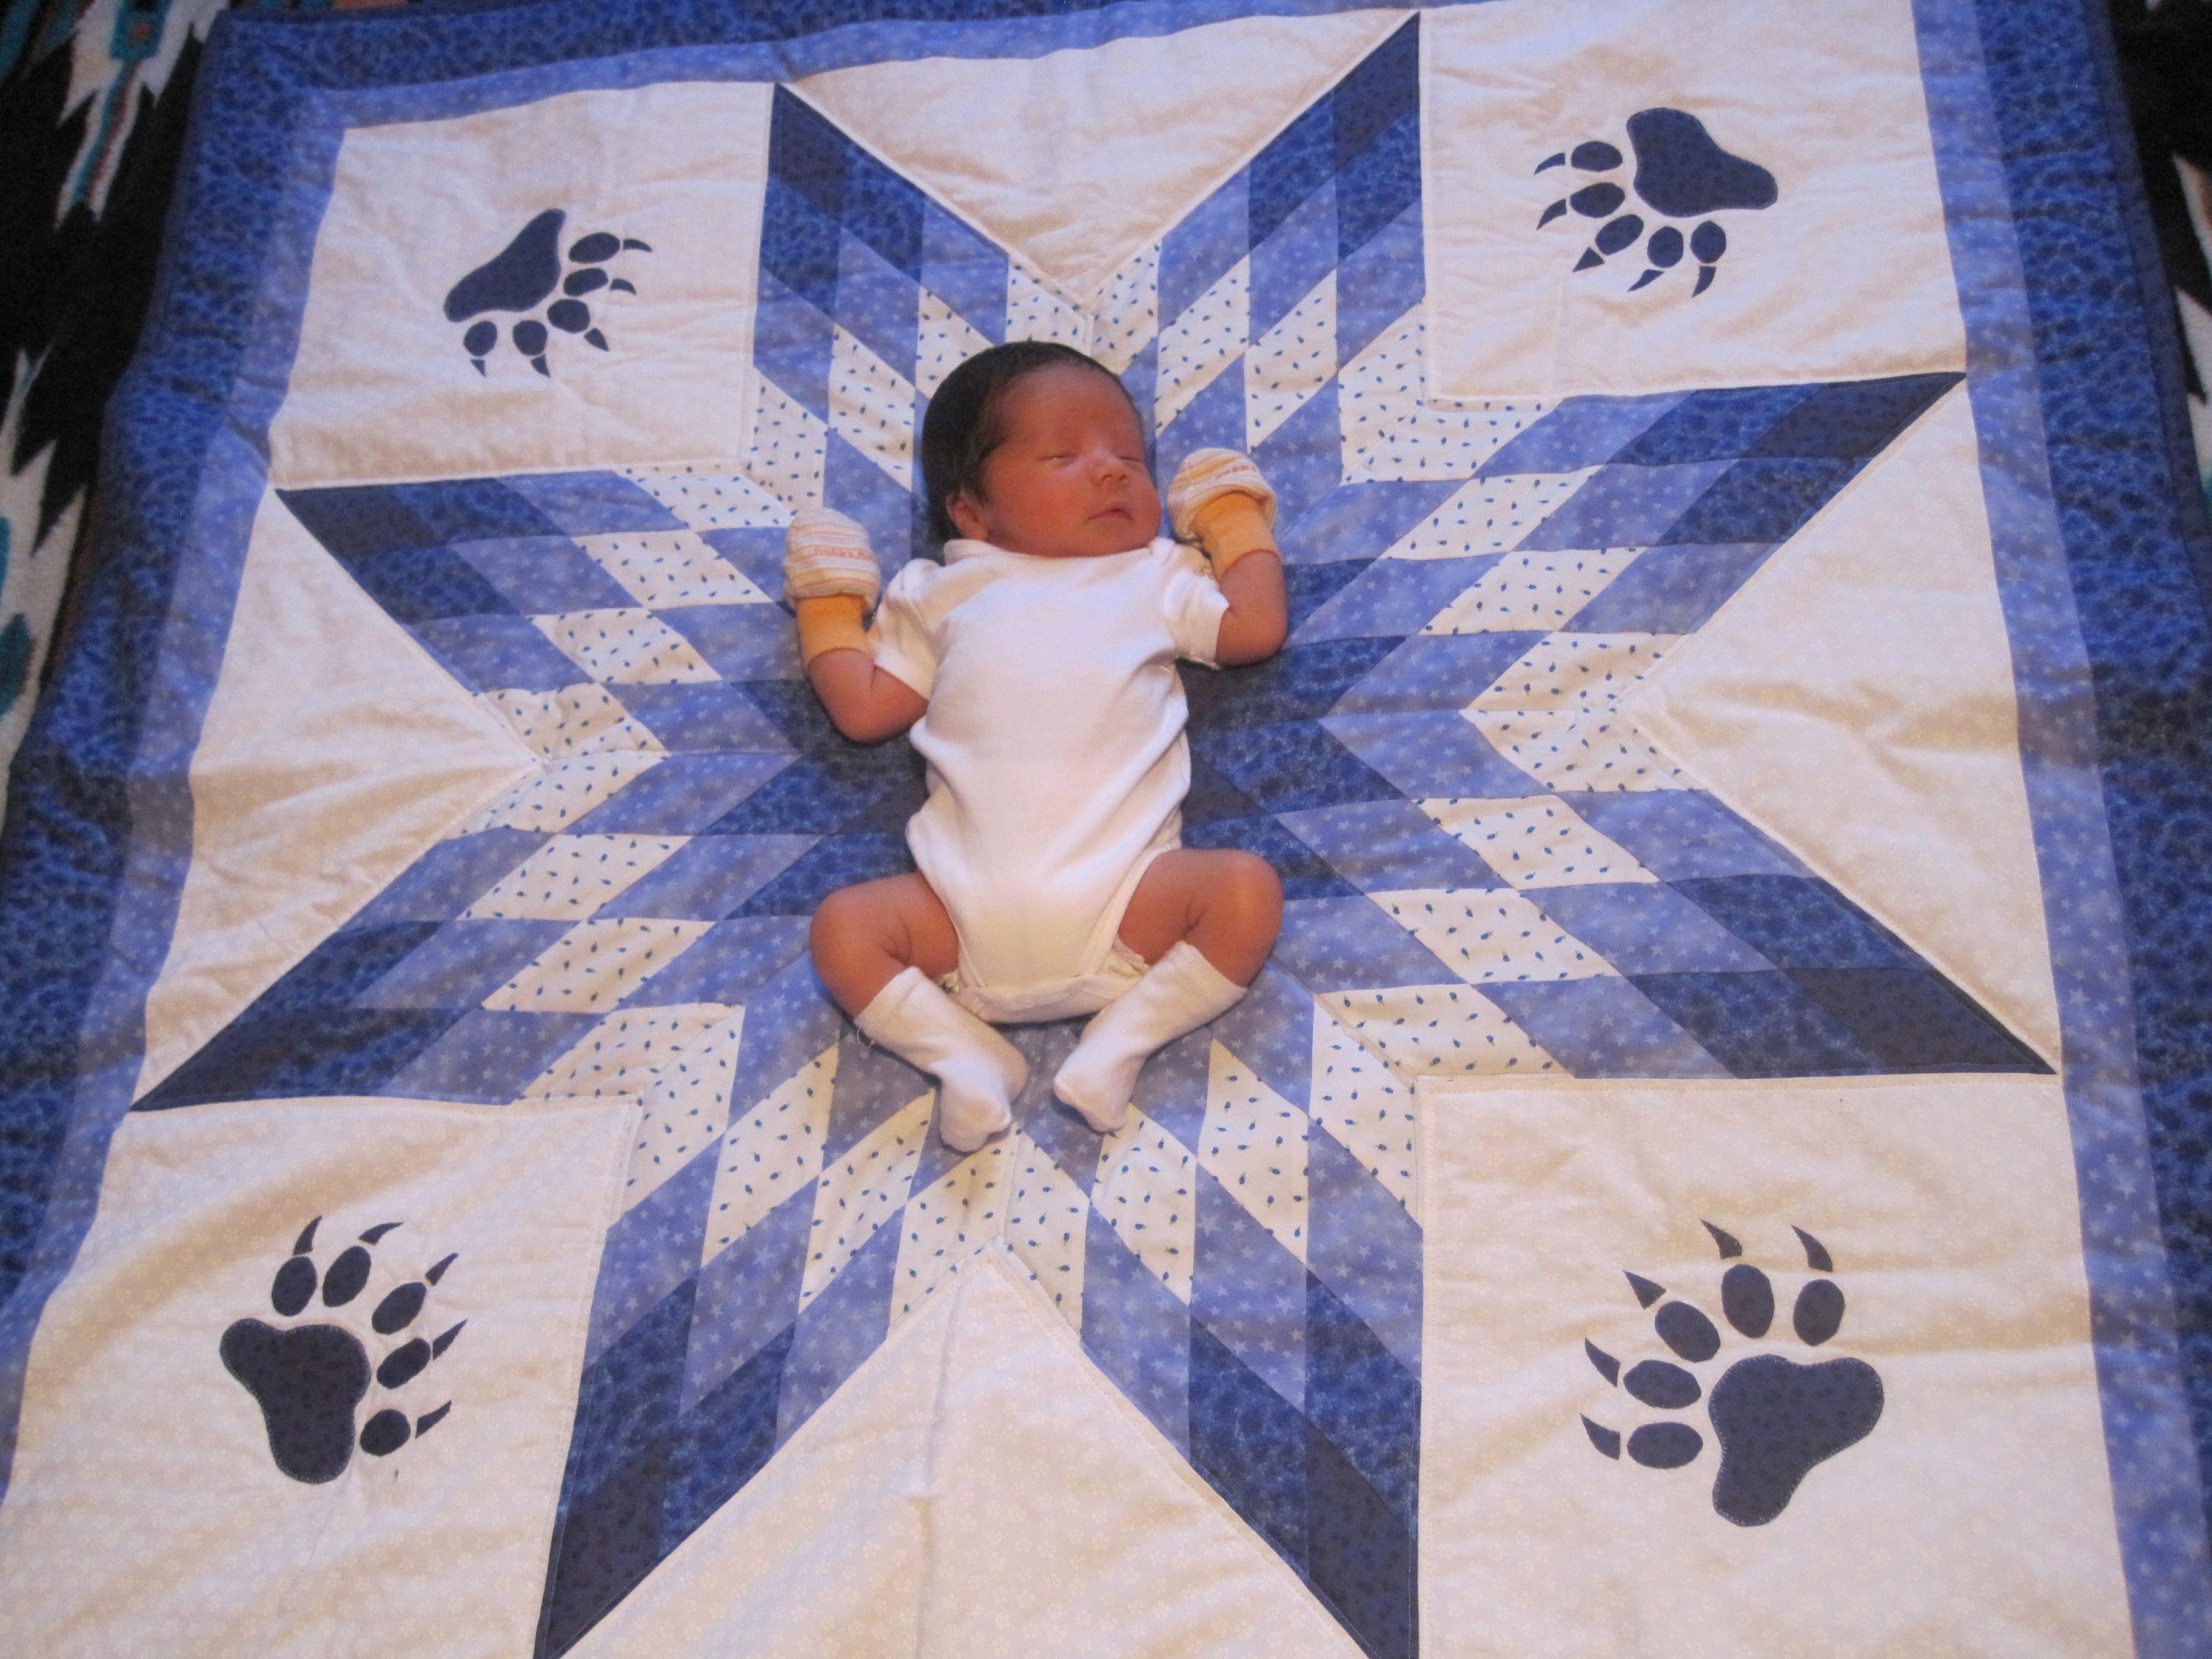 Baby Ezekiel's lone star quilt | My Handmade Baby Quilts ... : star baby quilt - Adamdwight.com